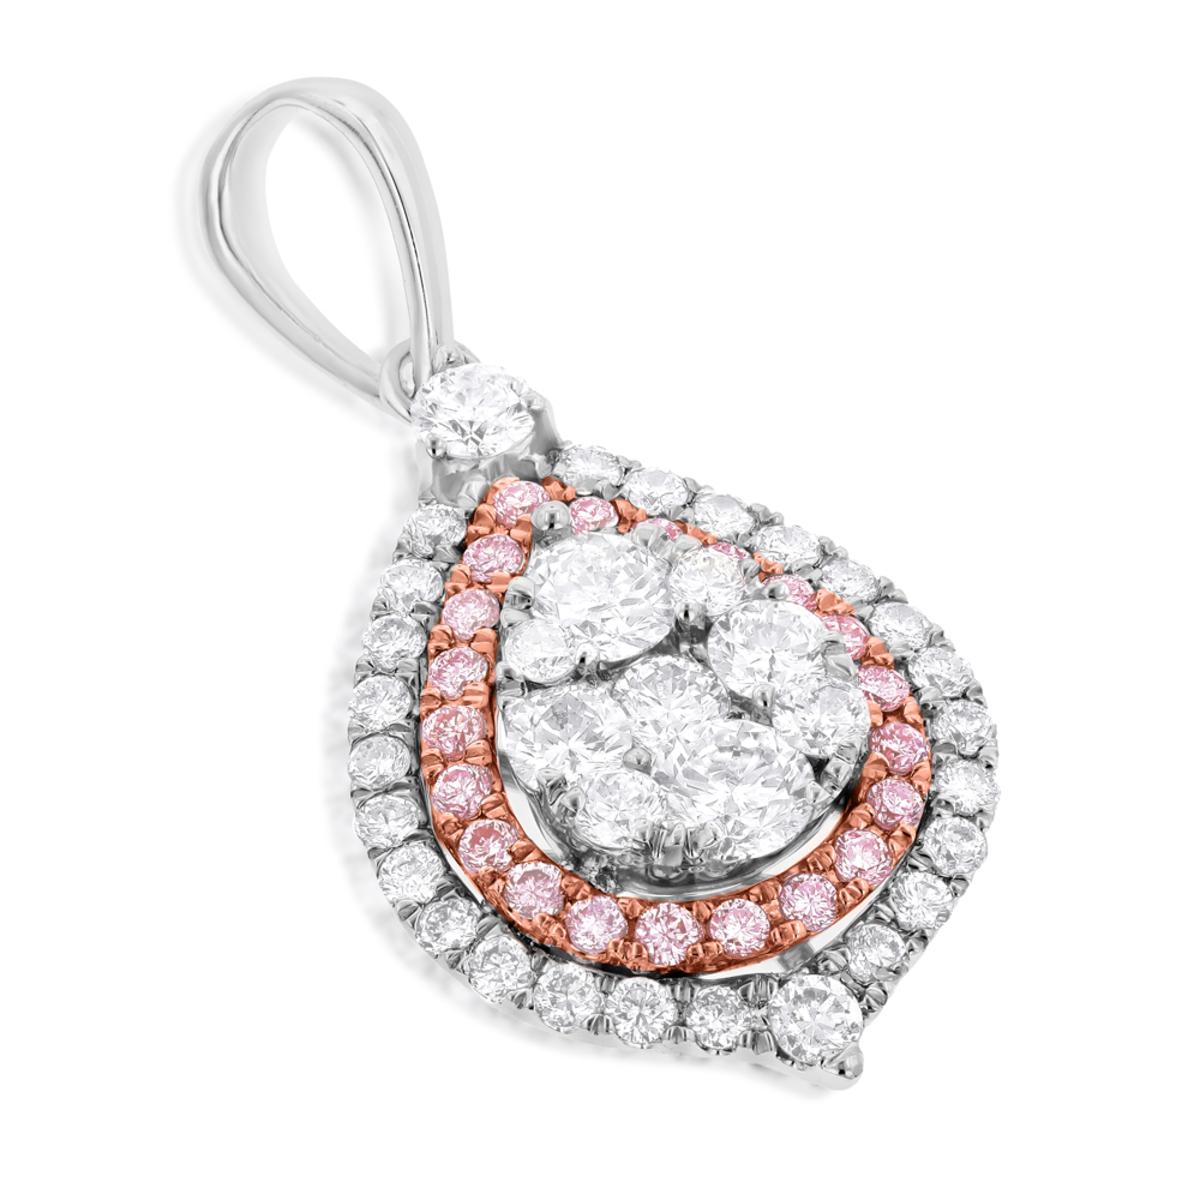 14K Gold Teardrop Shape Cluster White Pink Diamond Pendant for Women 1.25ct